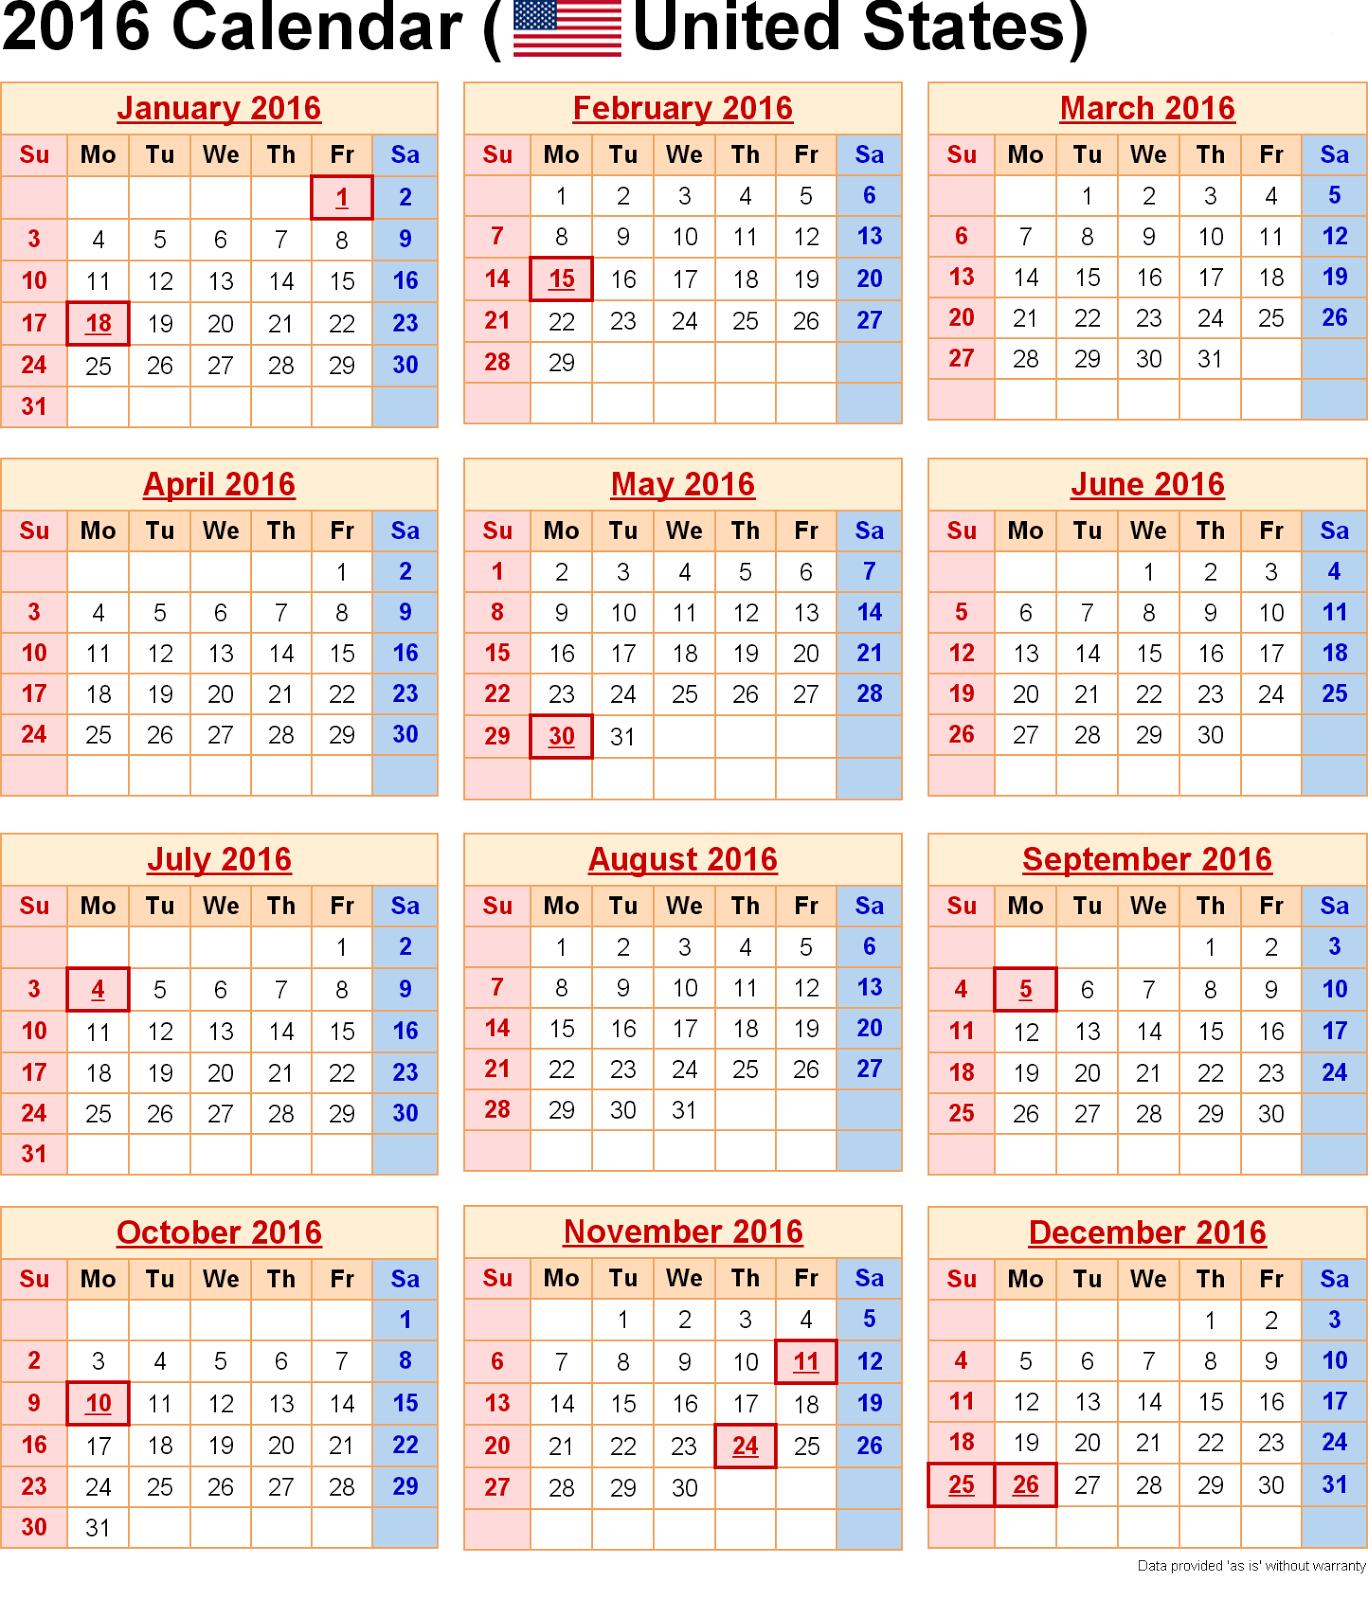 banking holidays: